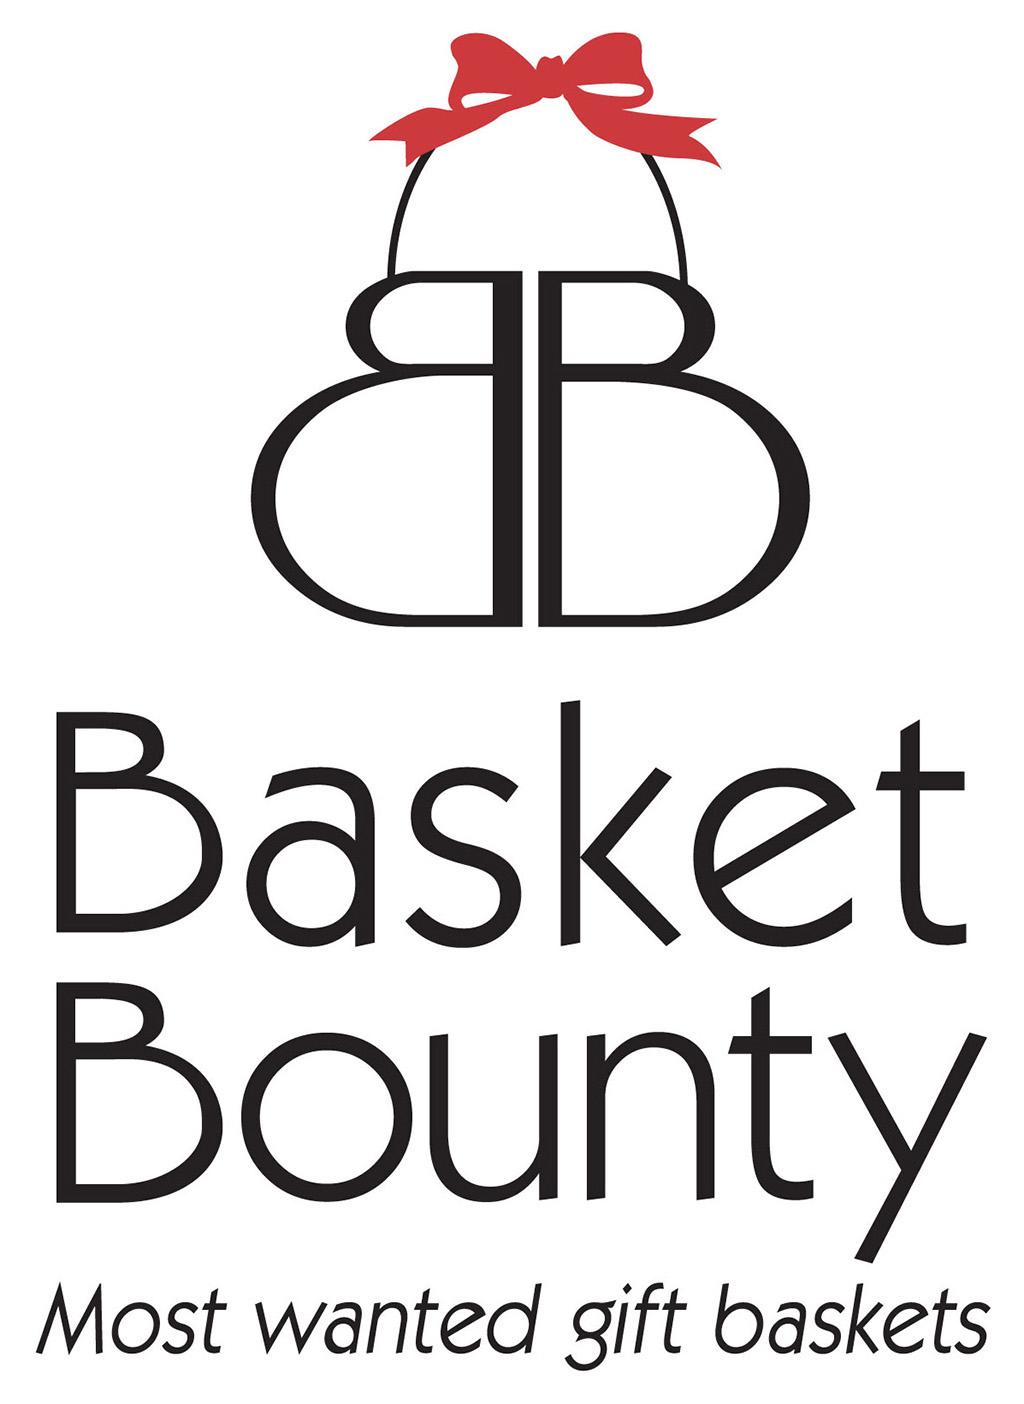 Gift Basket Company Logo for Basket Bounty designed by Kemp Design Services